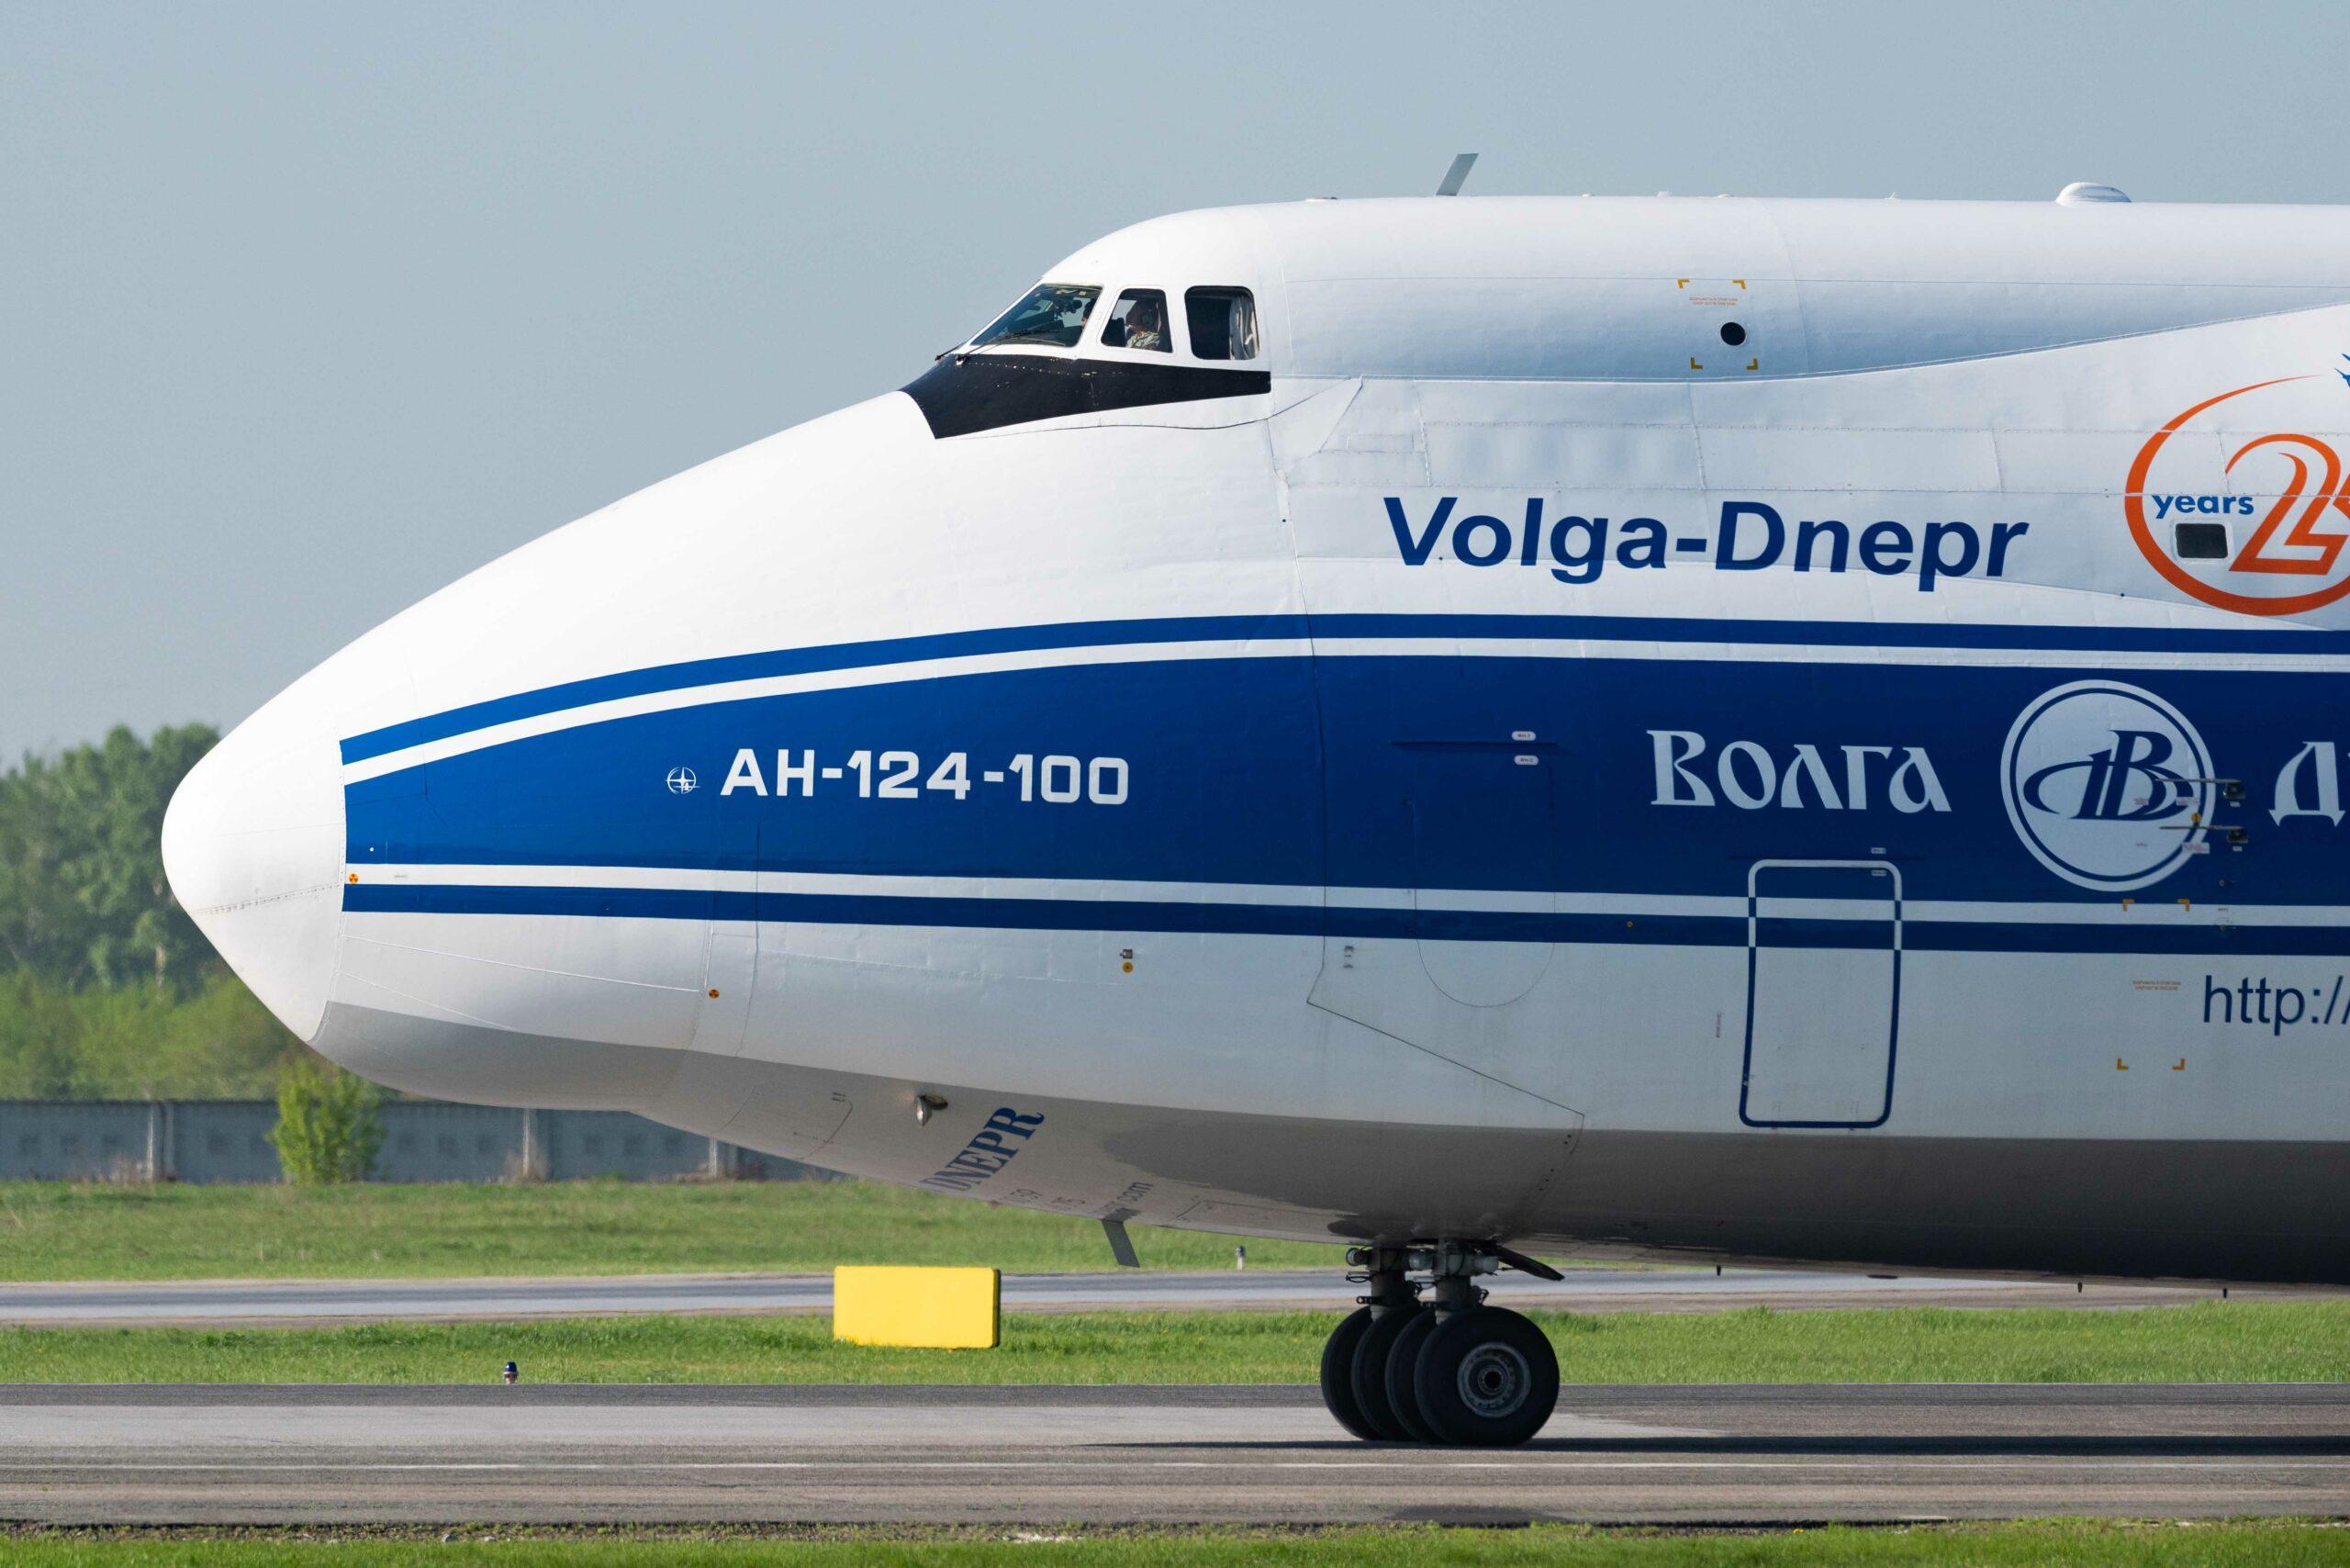 Volga-Dnepr back in business after grounding last November 1